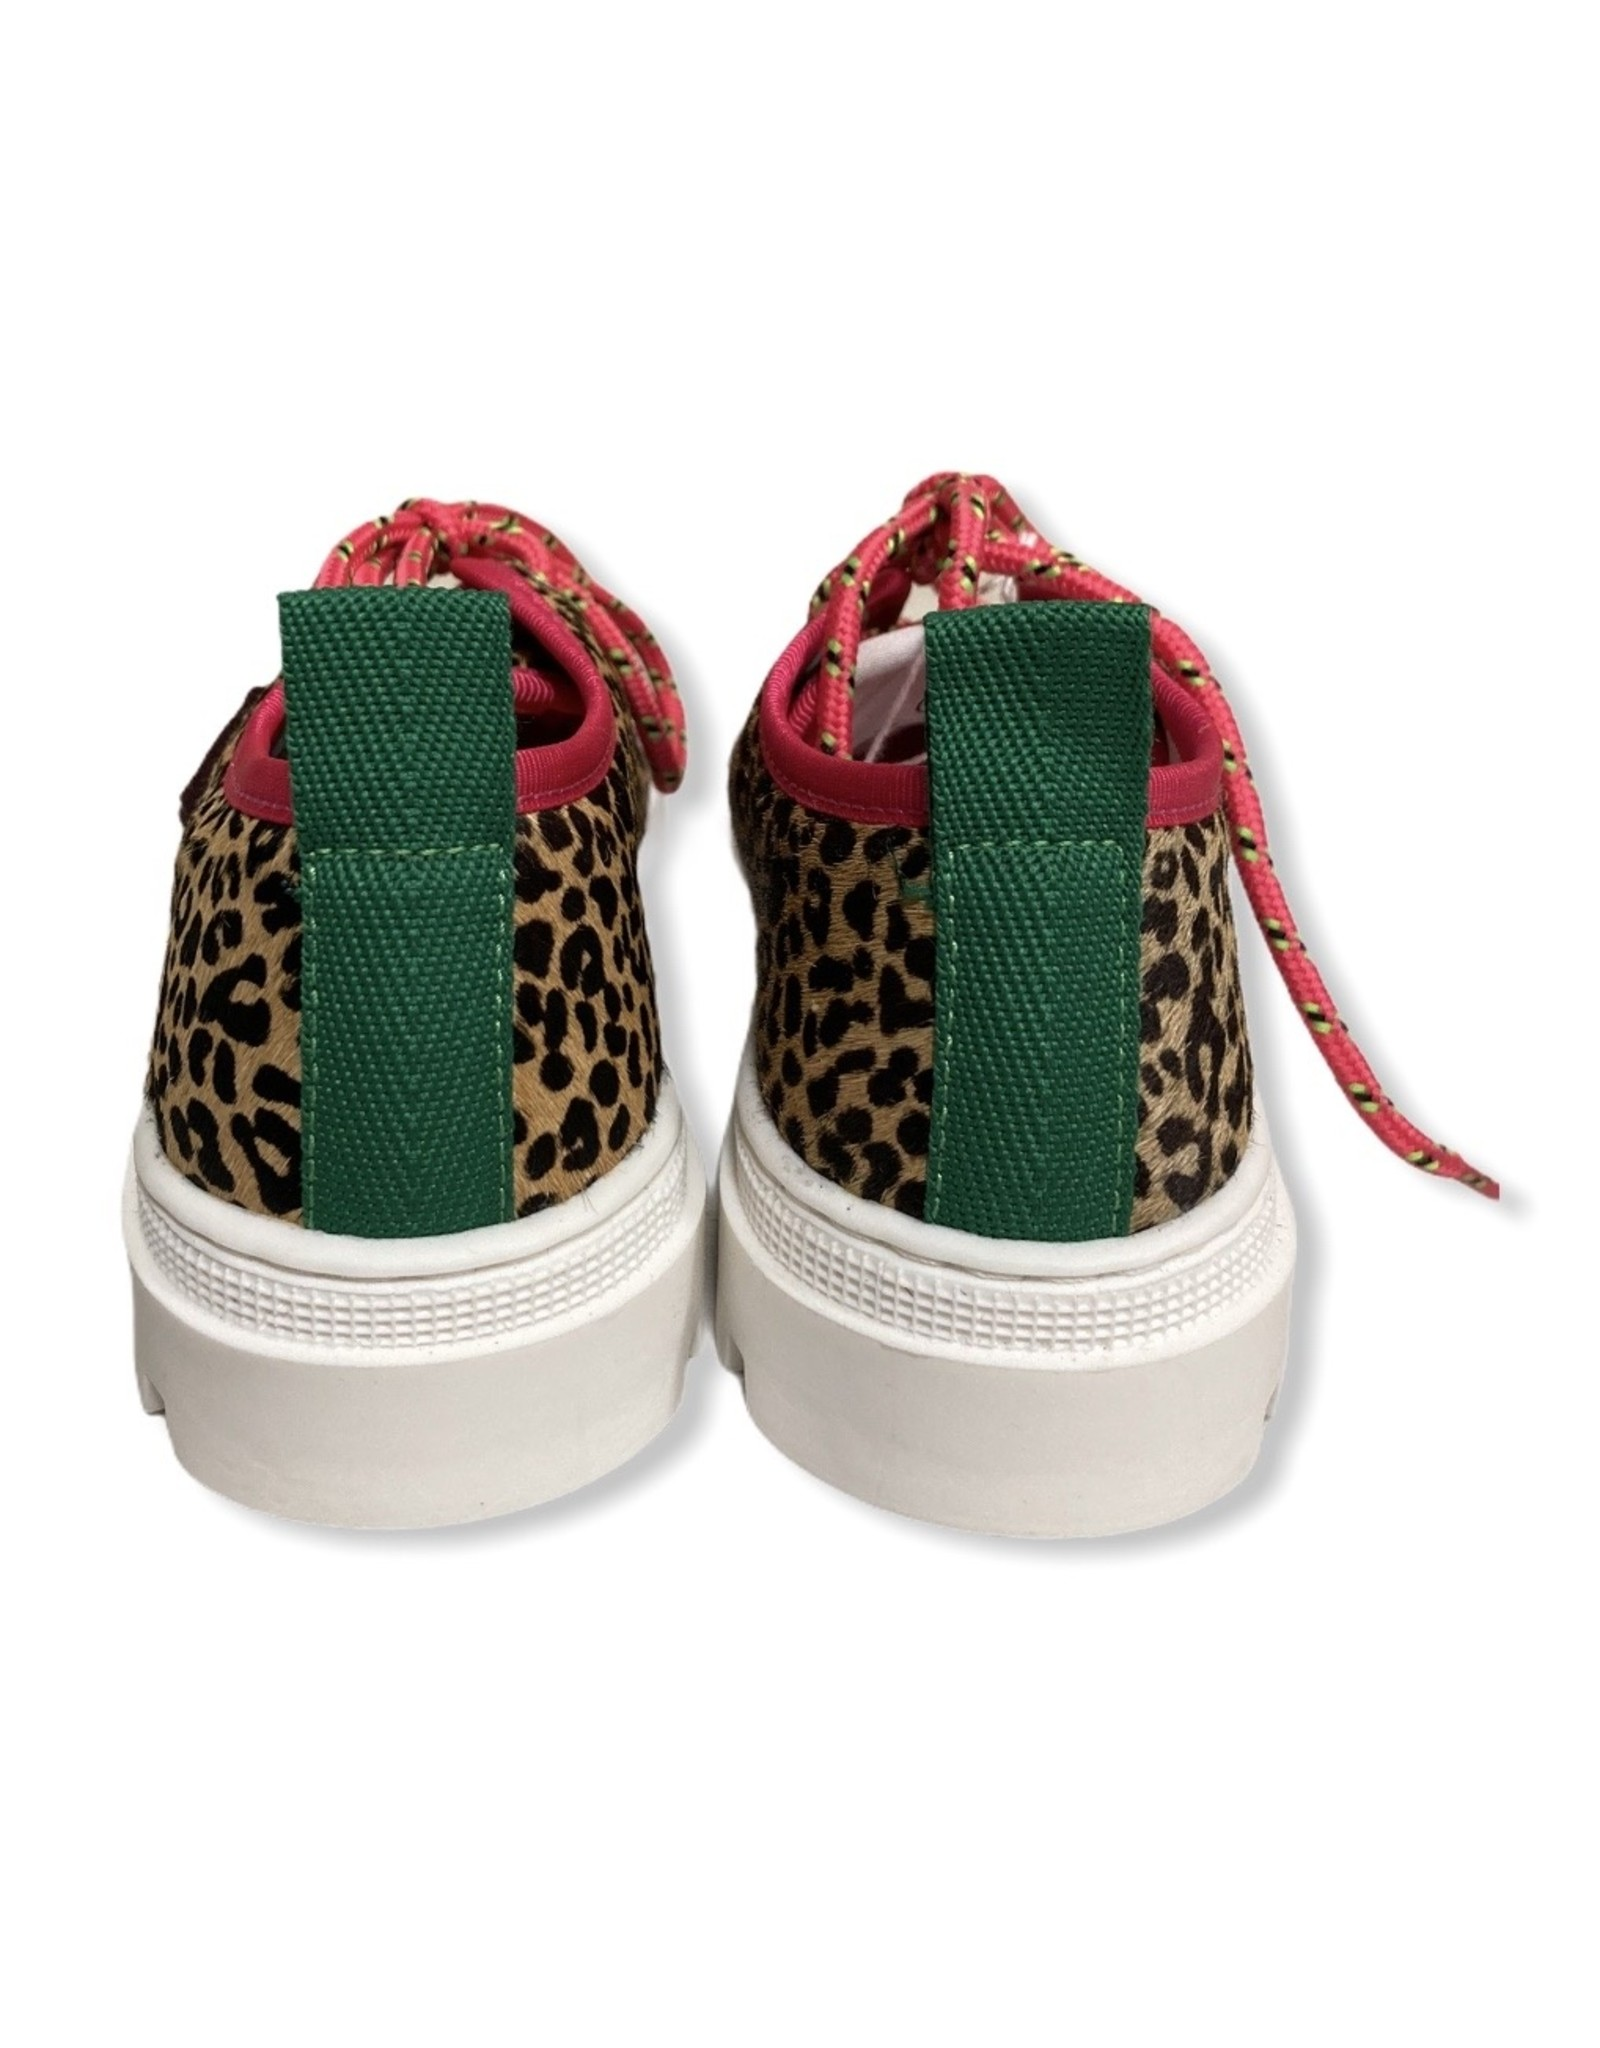 Maison Mangostan Gungo leopard stapper